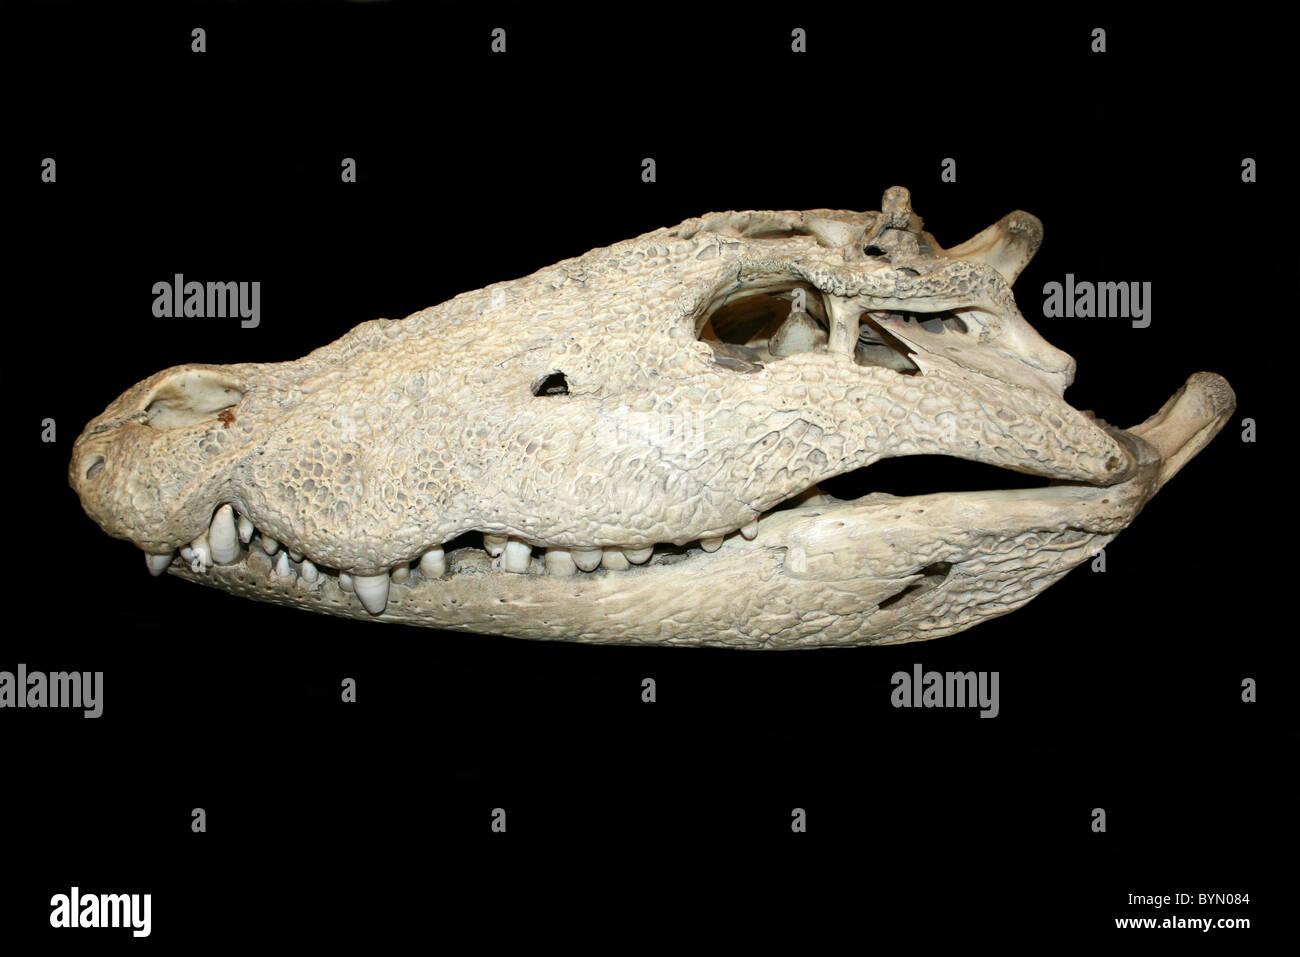 https://c8.alamy.com/comp/BYN084/side-view-of-a-young-nile-crocodile-skull-BYN084.jpg